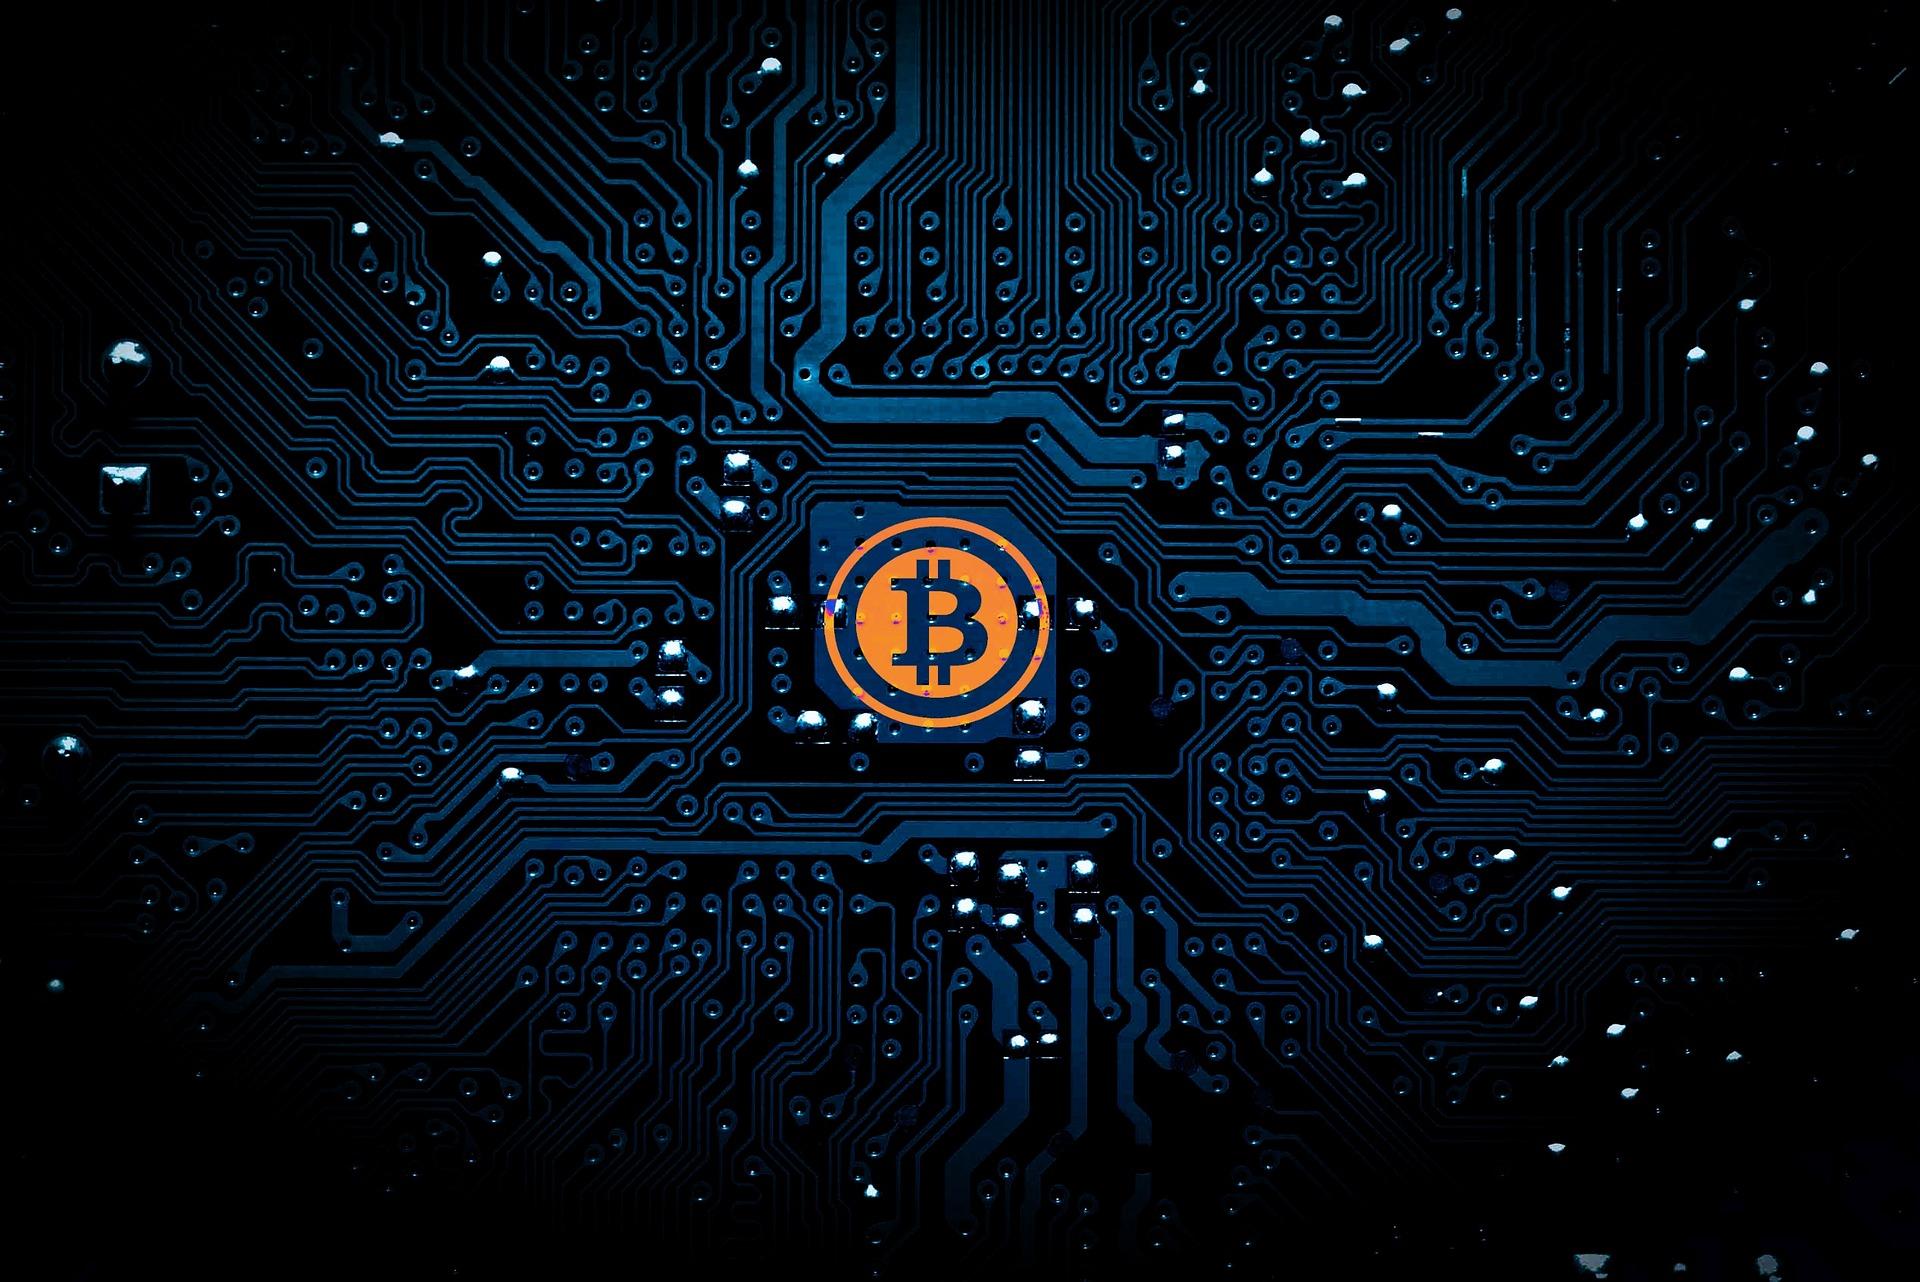 Bitcoin Bounty Hunt: FPS játék satoshi jutalmakkal